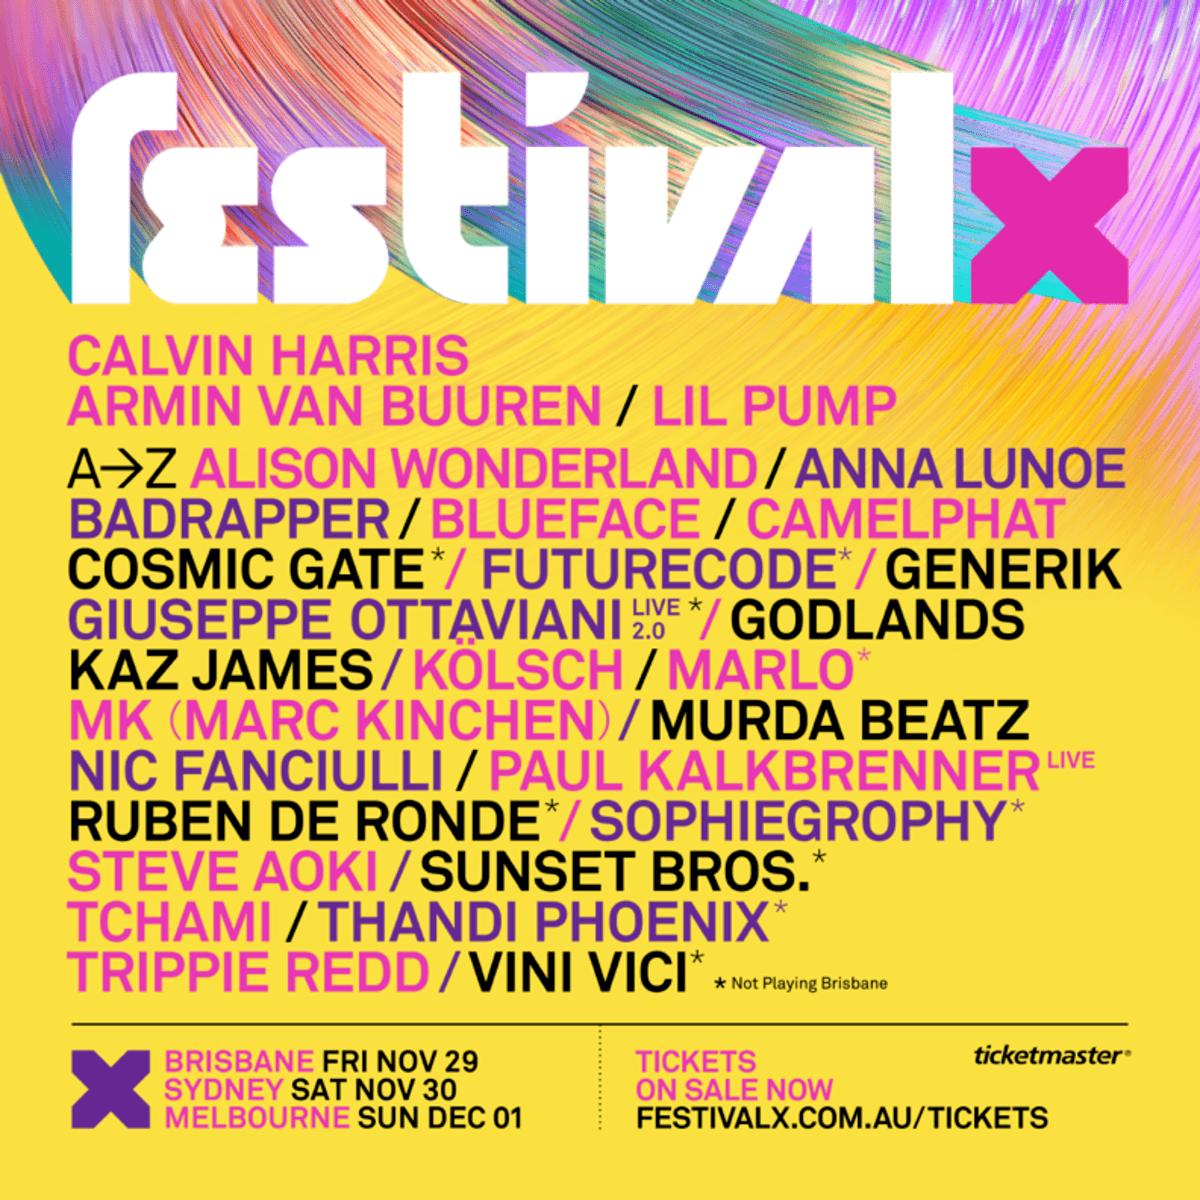 Festival X Ausrtralia - EDM Festivals